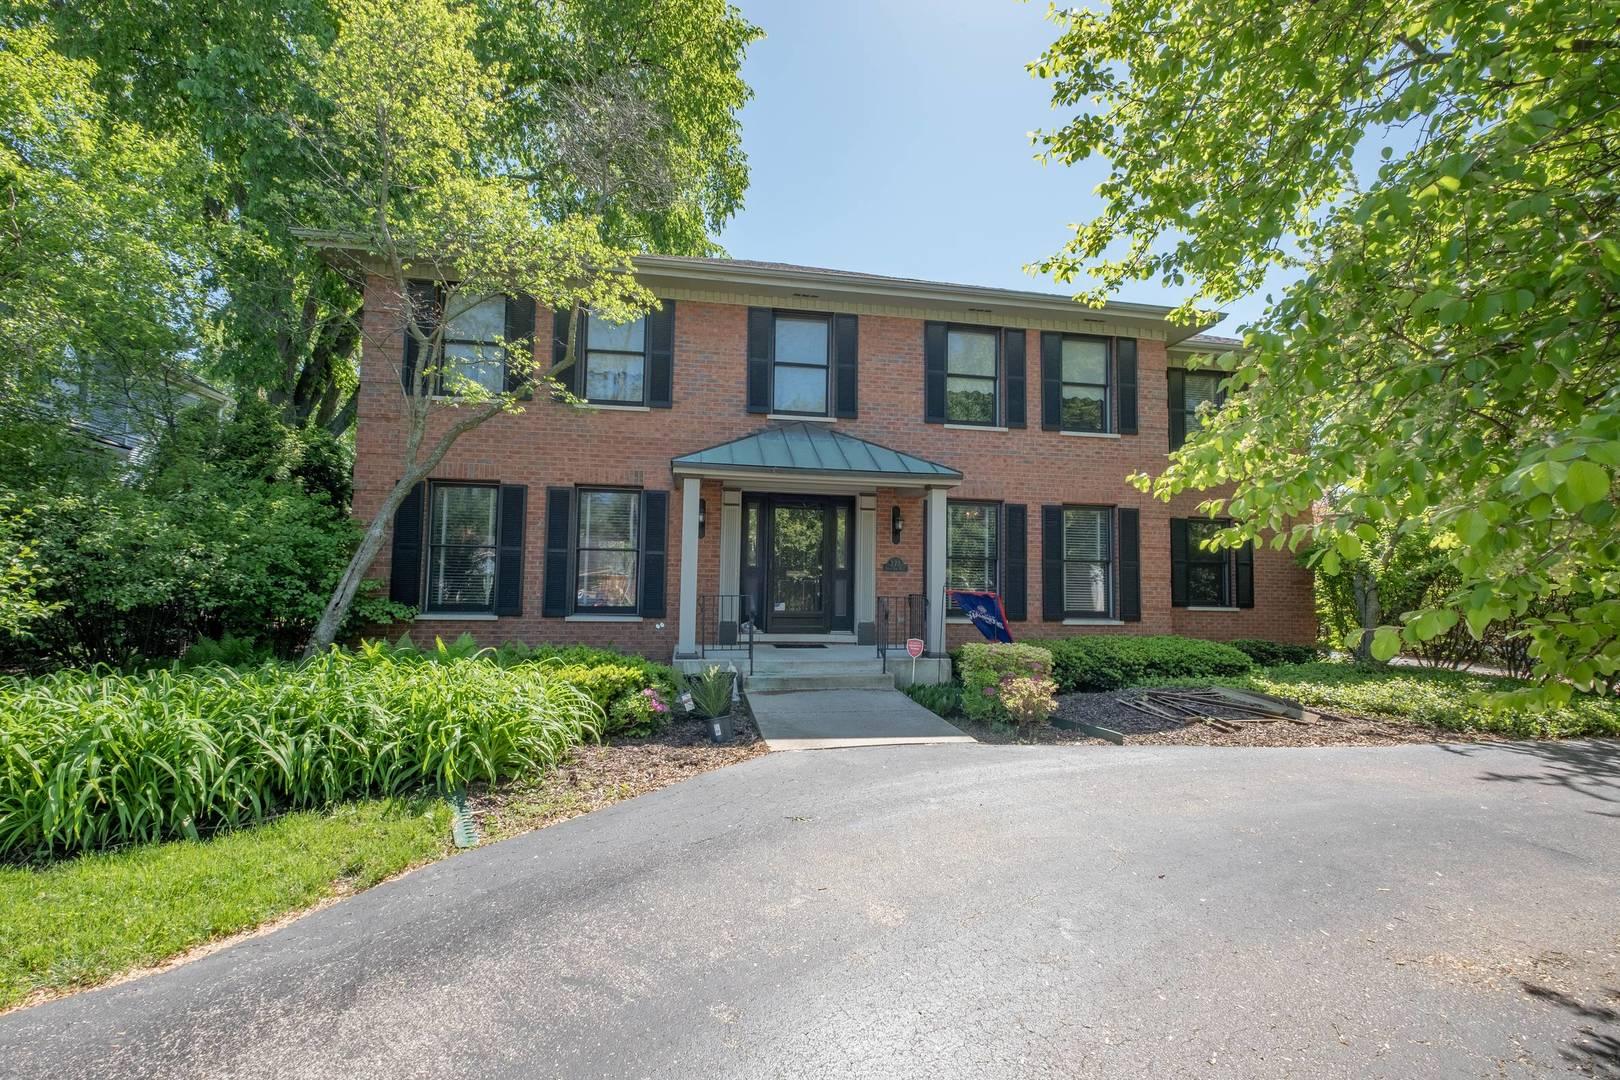 273 South York Street 60126 - One of Elmhurst Homes for Sale